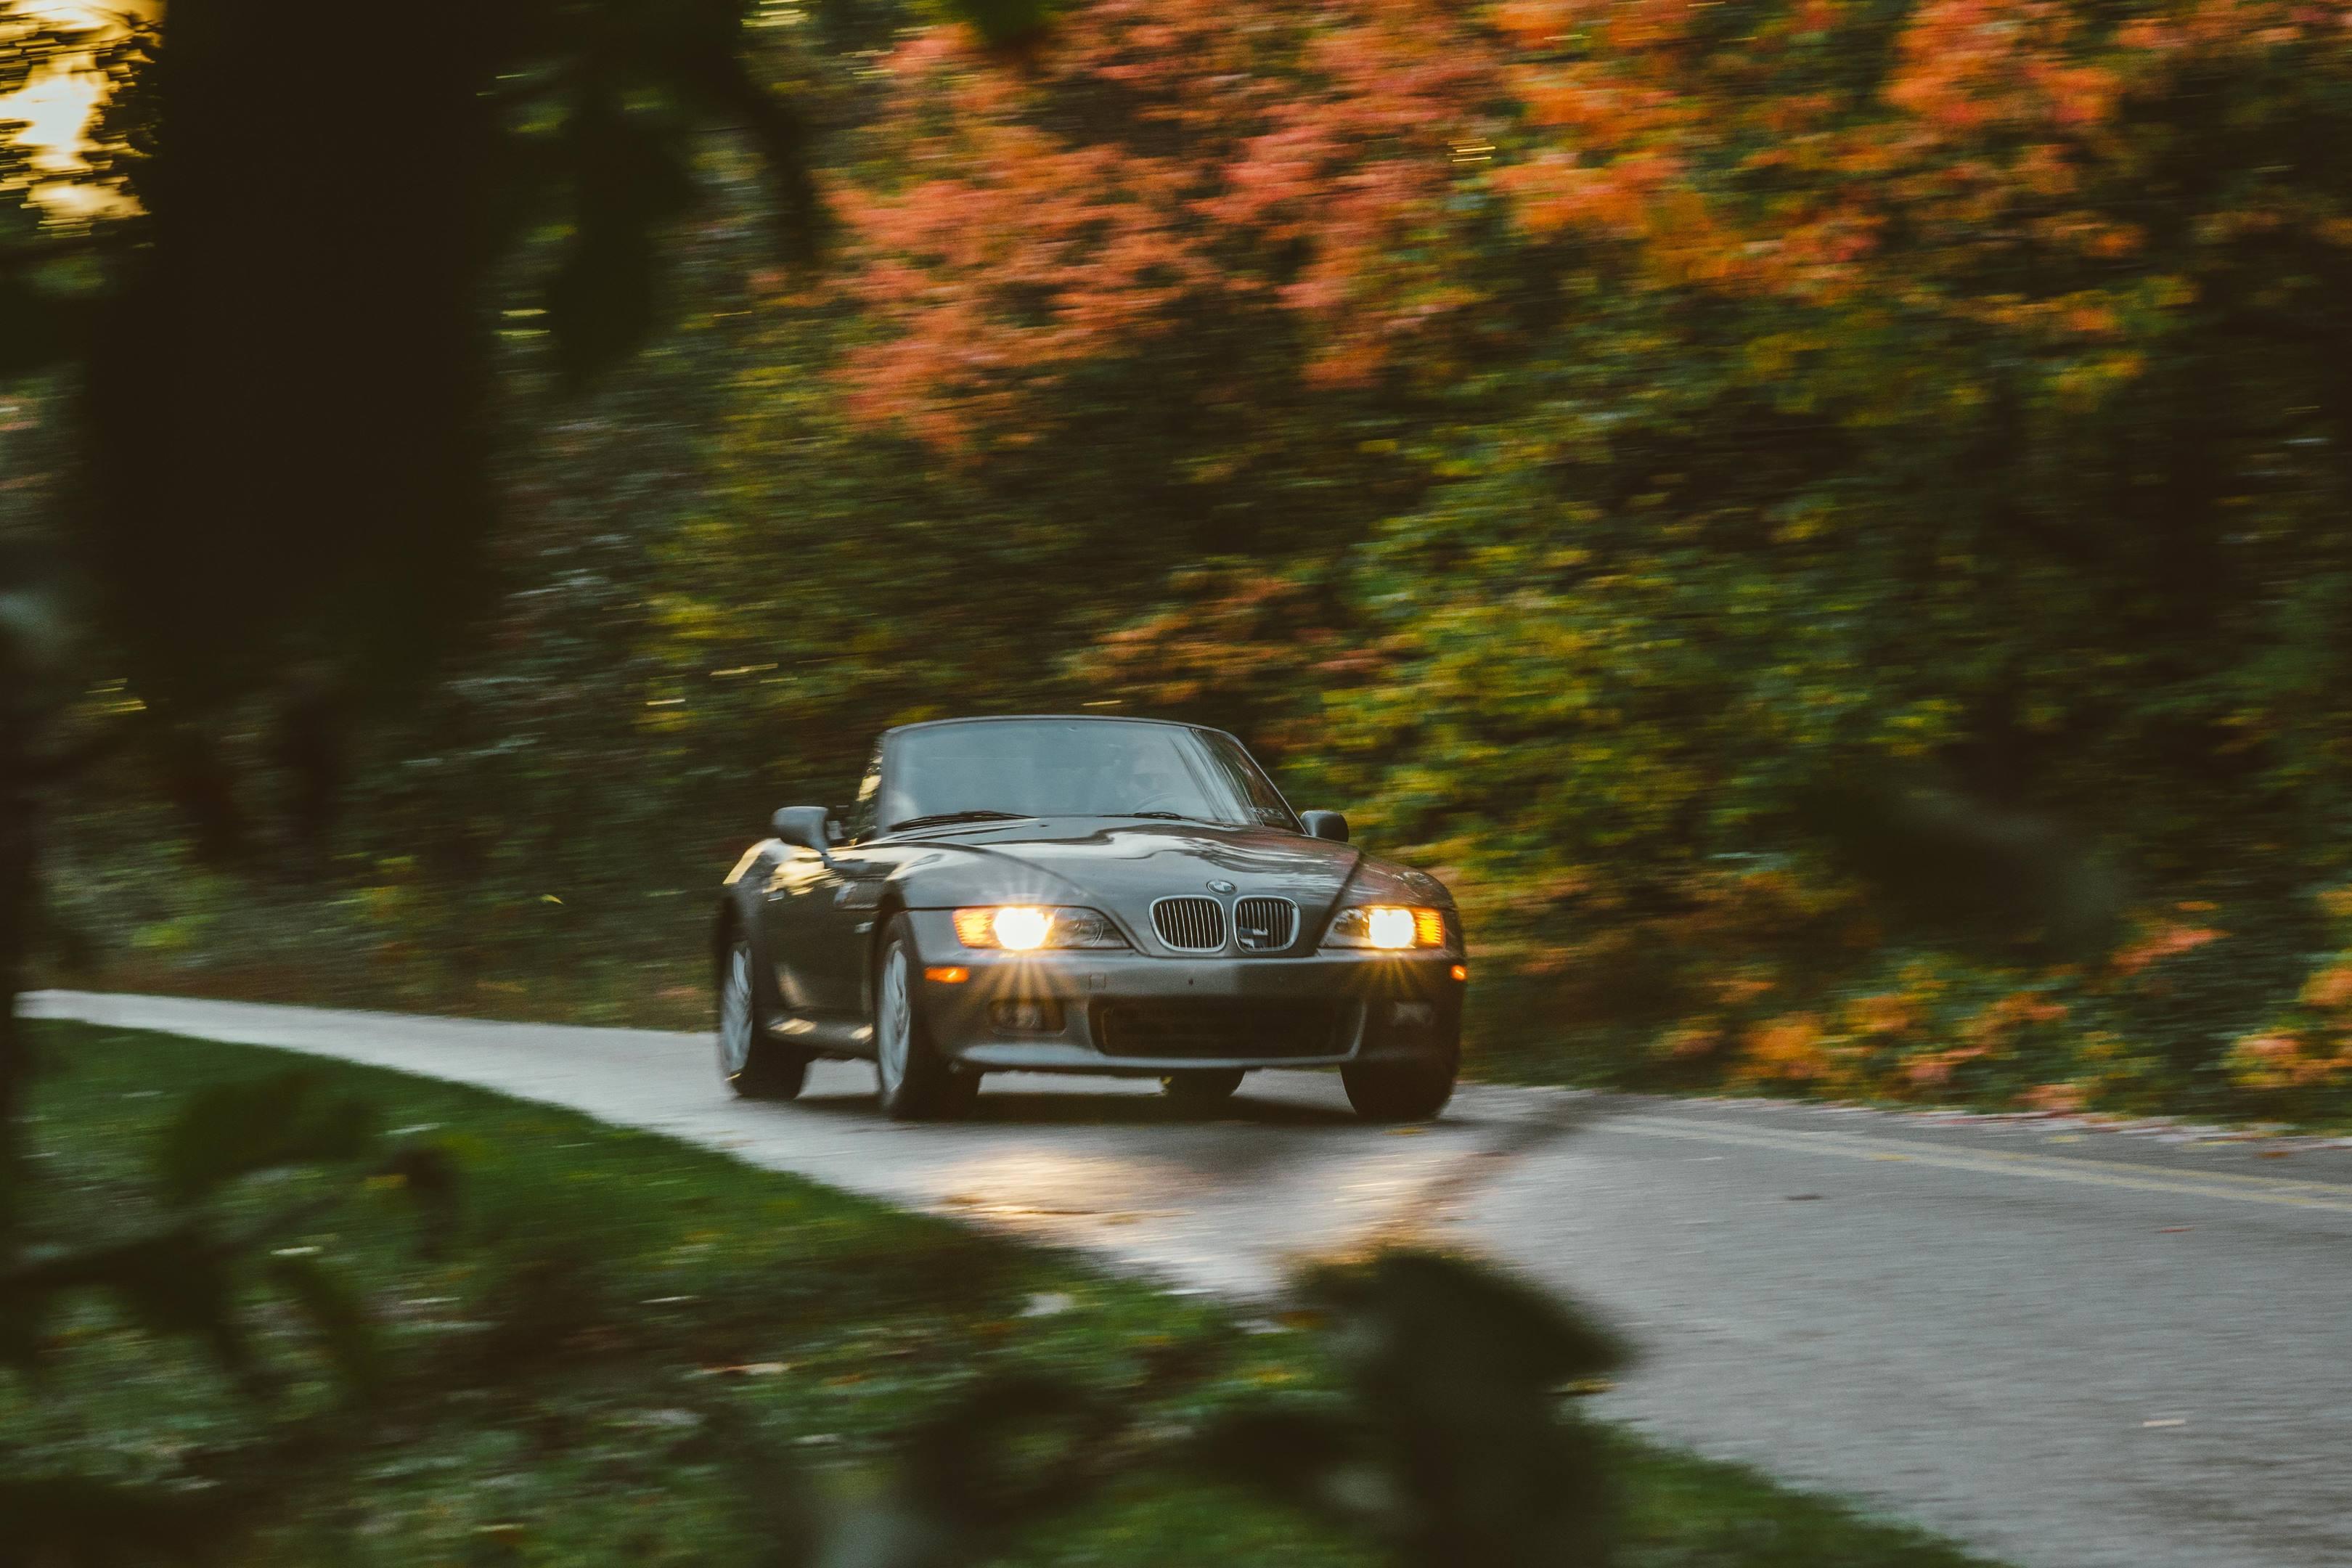 2001 BMW Z3 2.5i driving headlights